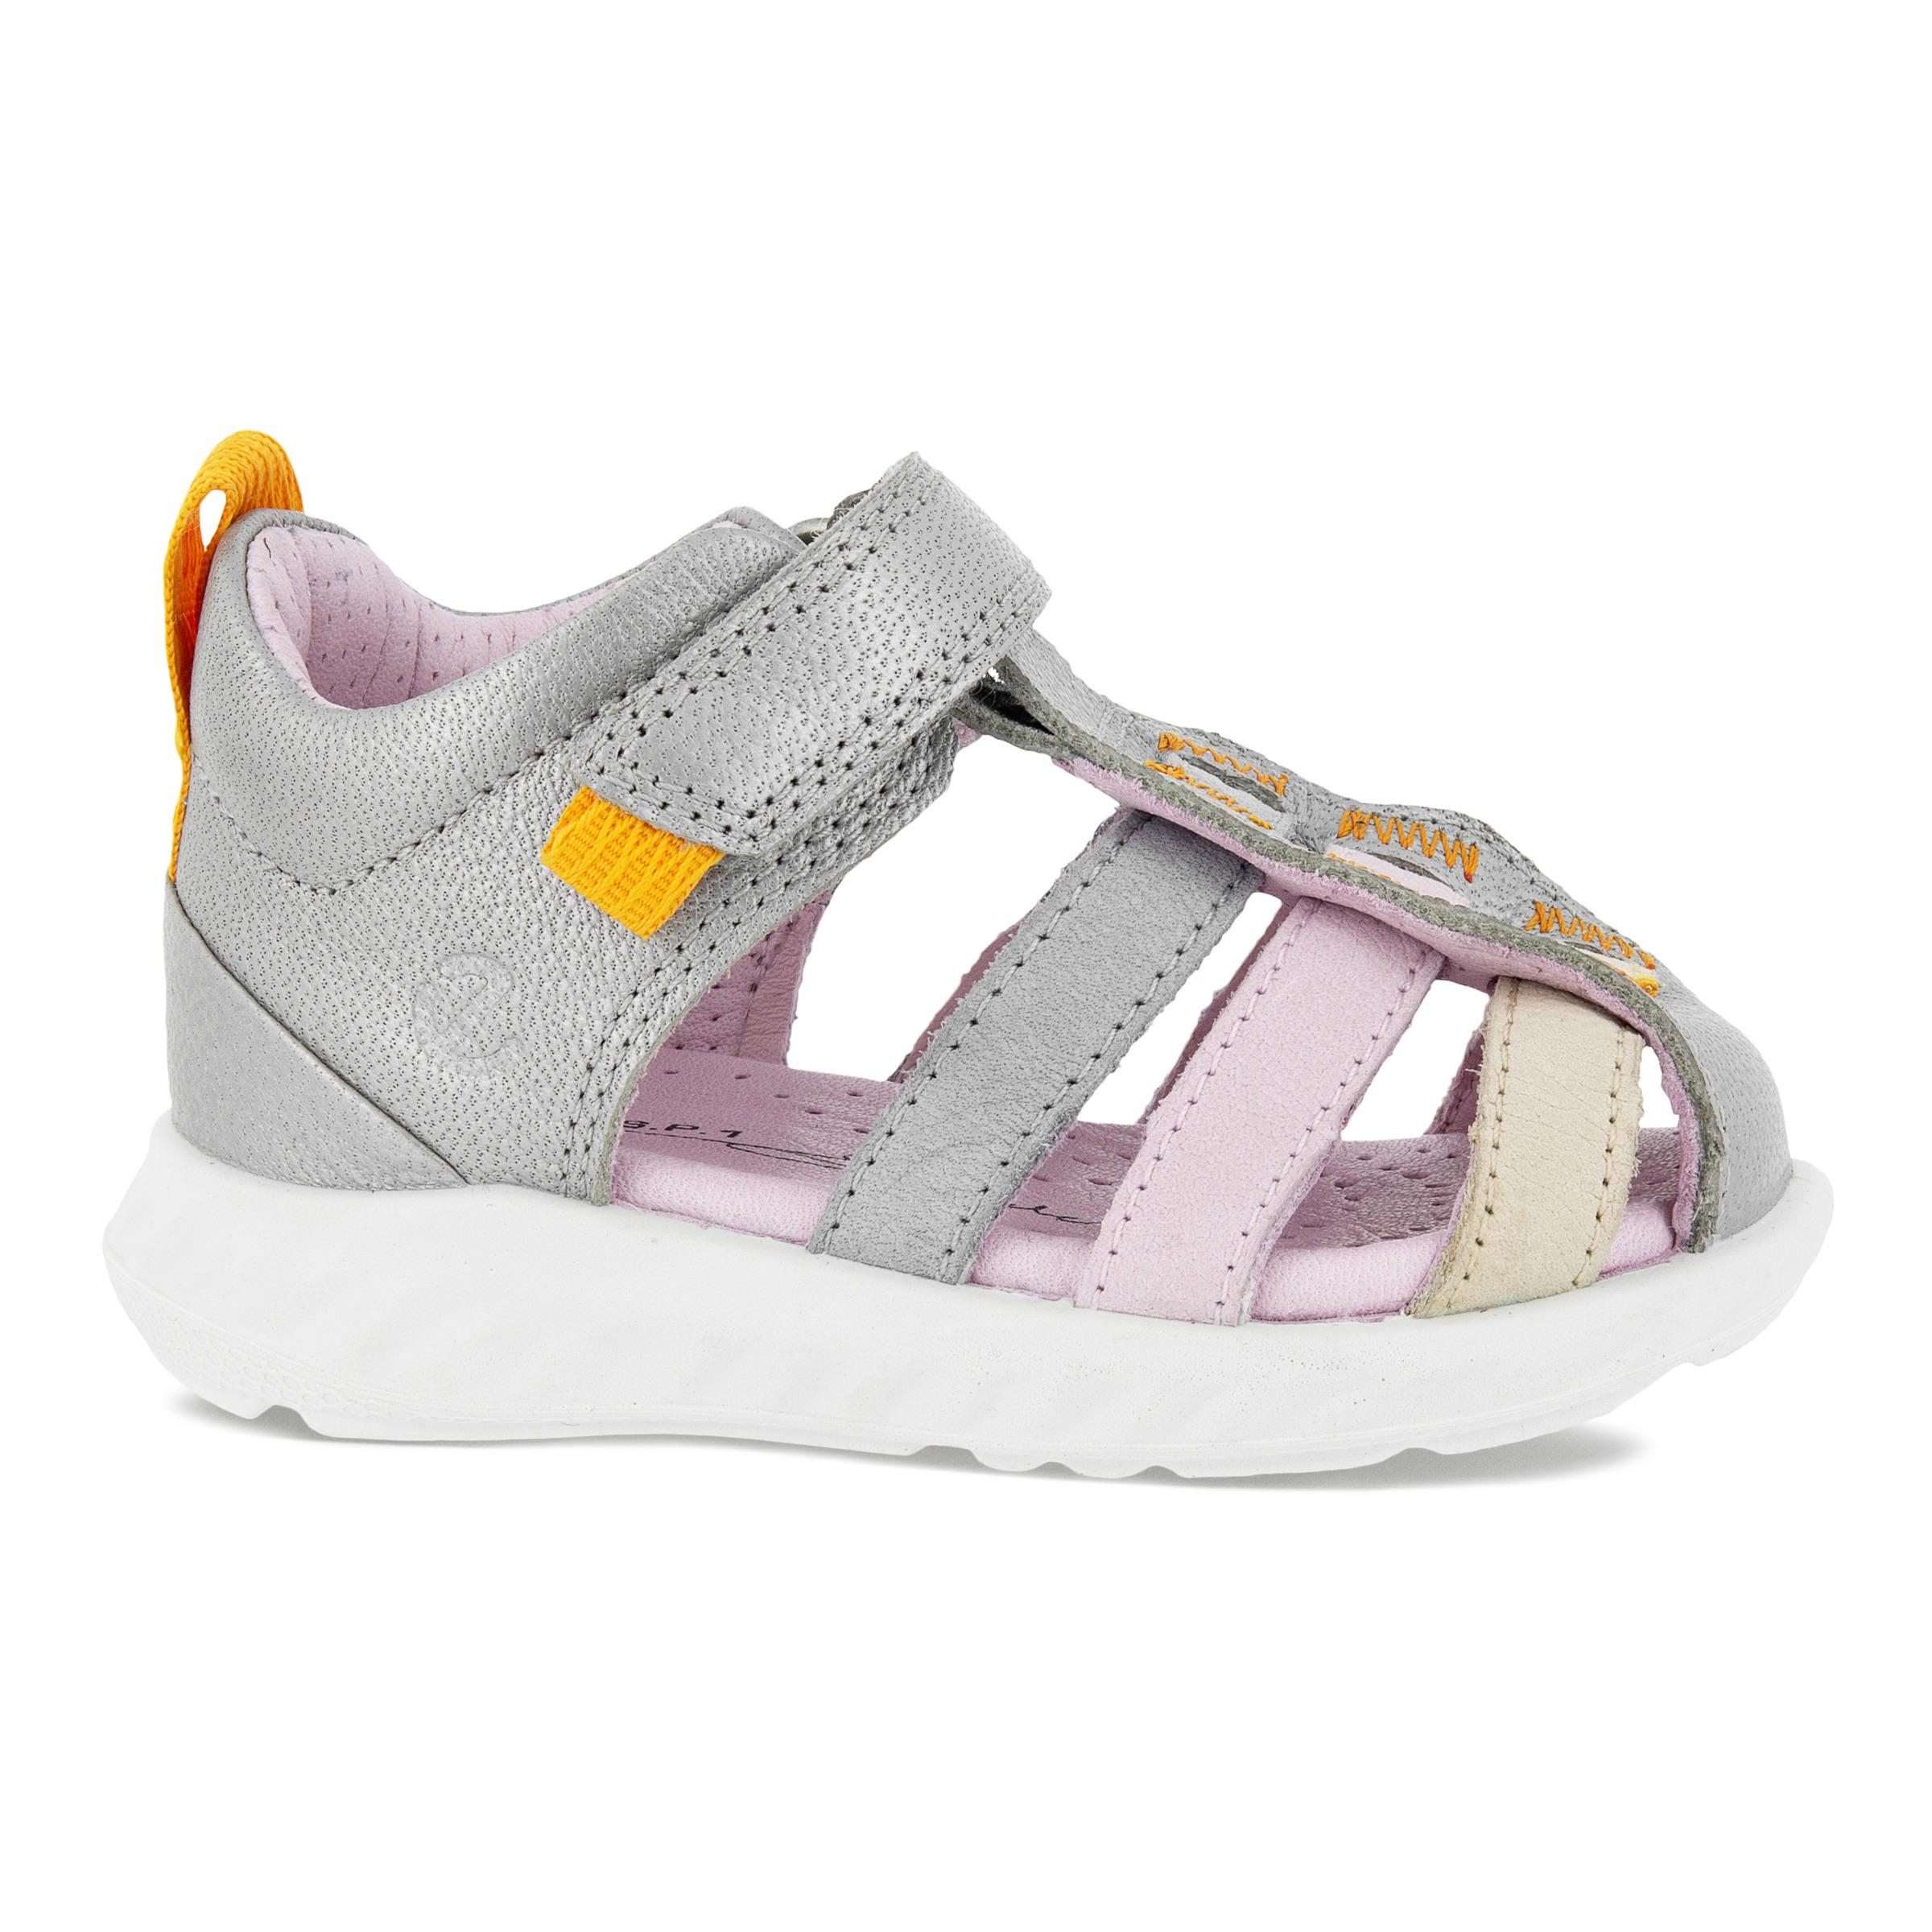 Ecco SP.1 Lite Infant sandal